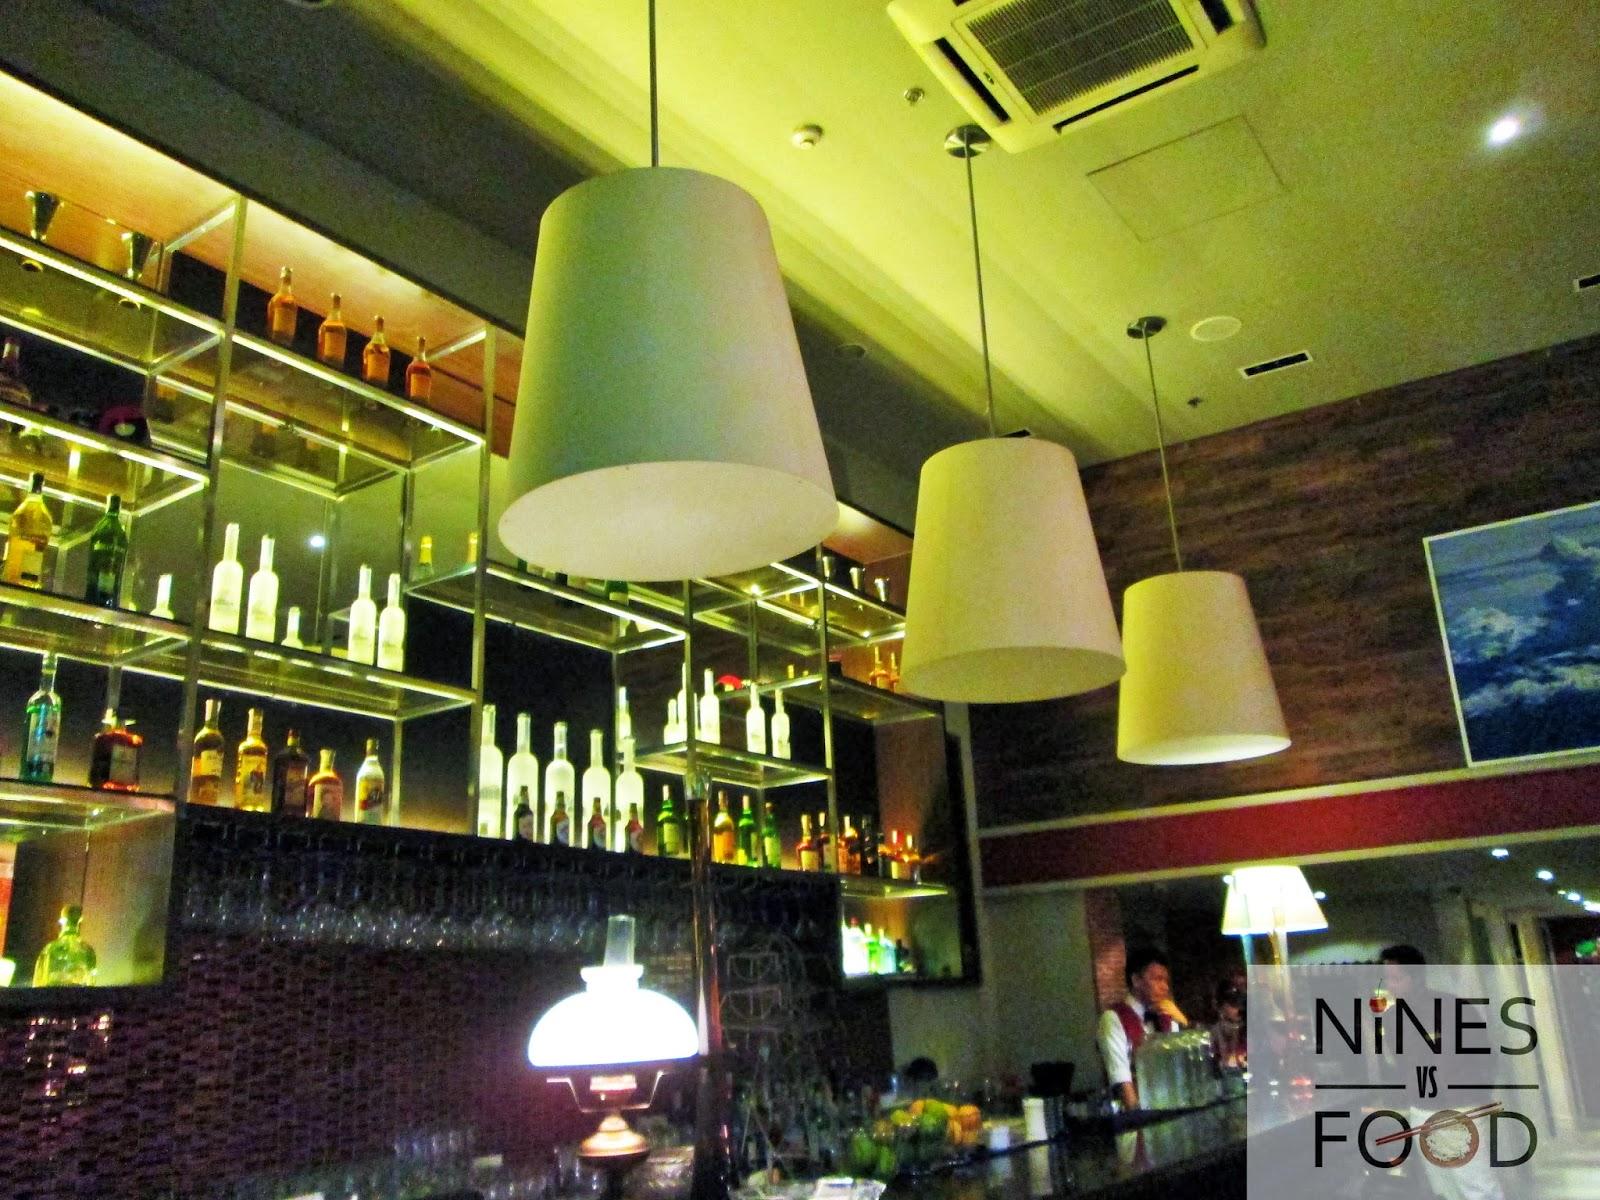 Nines vs. Food - Olive Tree Kitchen and Bar-2.jpg